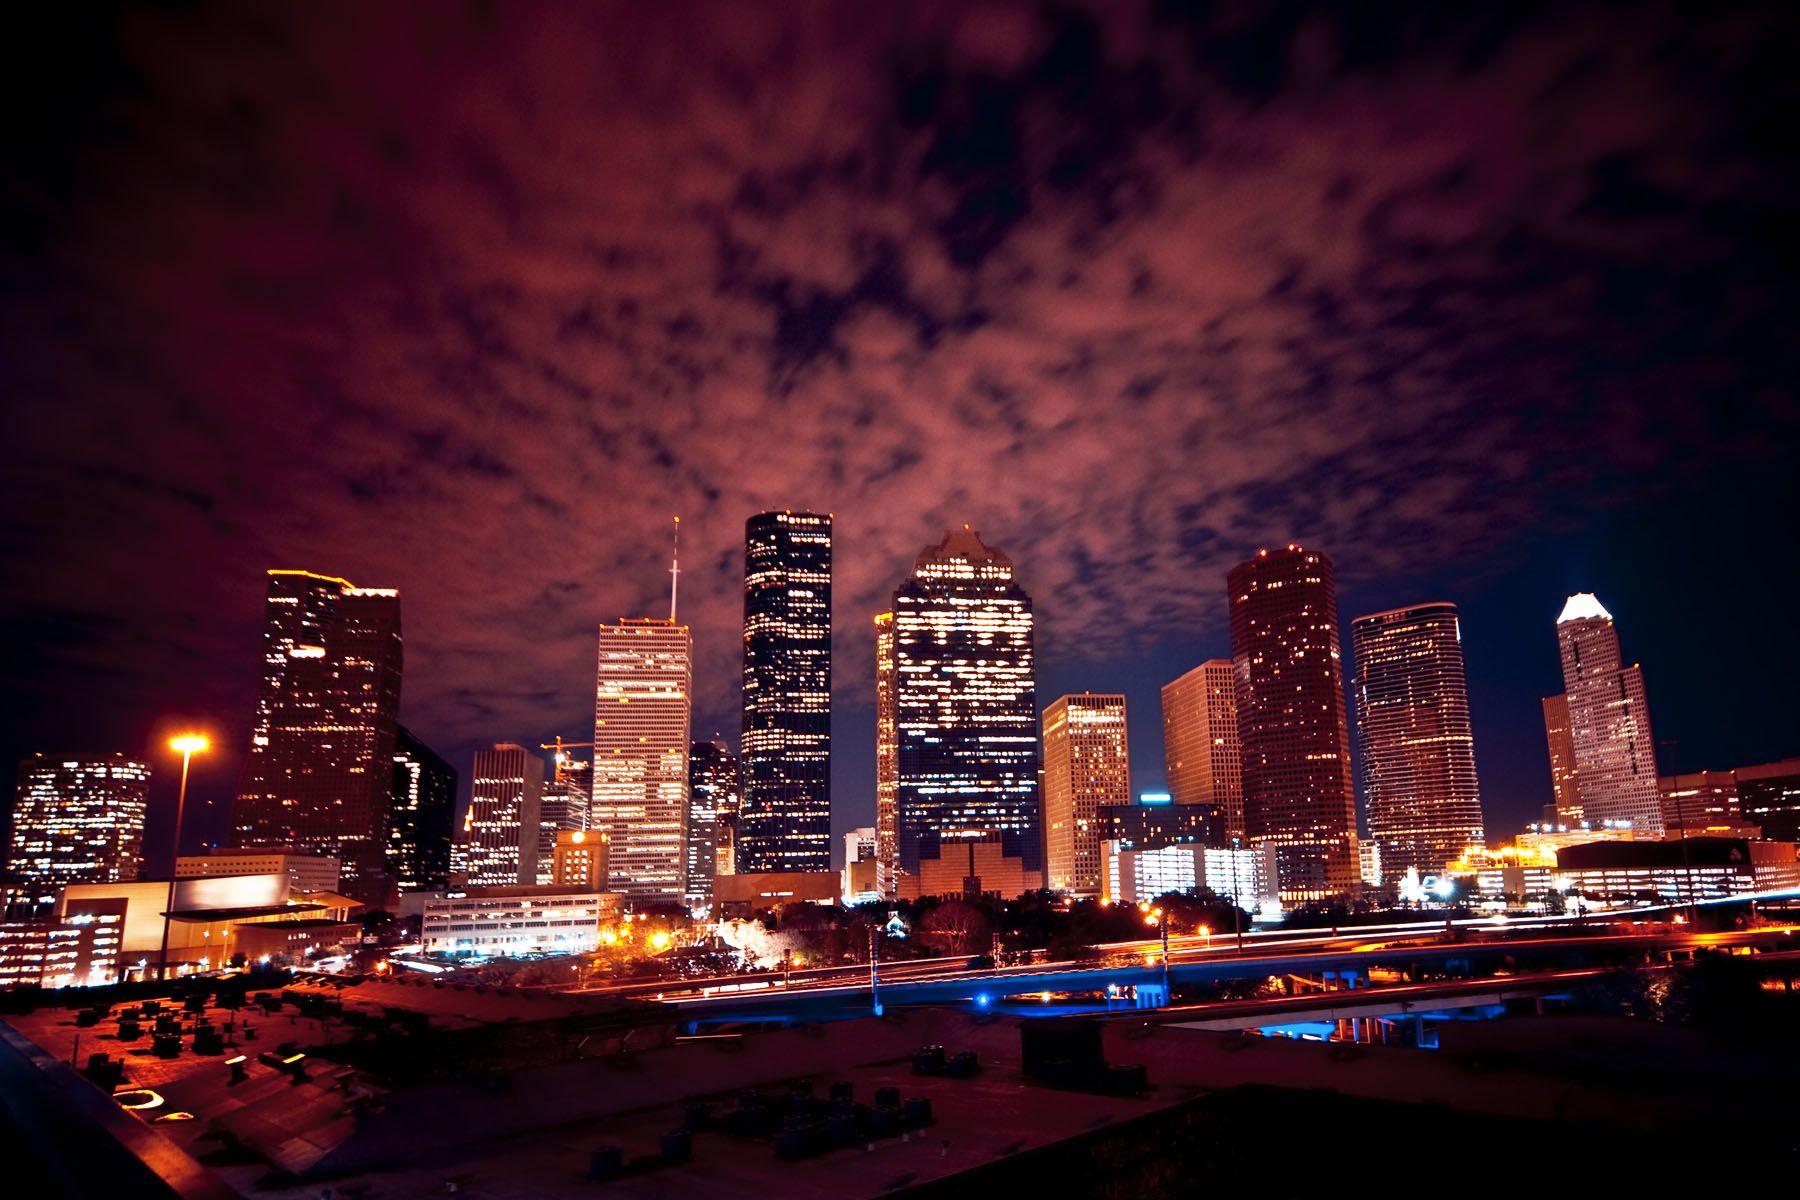 houston skyline at night in the city down on main street pinterest houston skyline texas. Black Bedroom Furniture Sets. Home Design Ideas